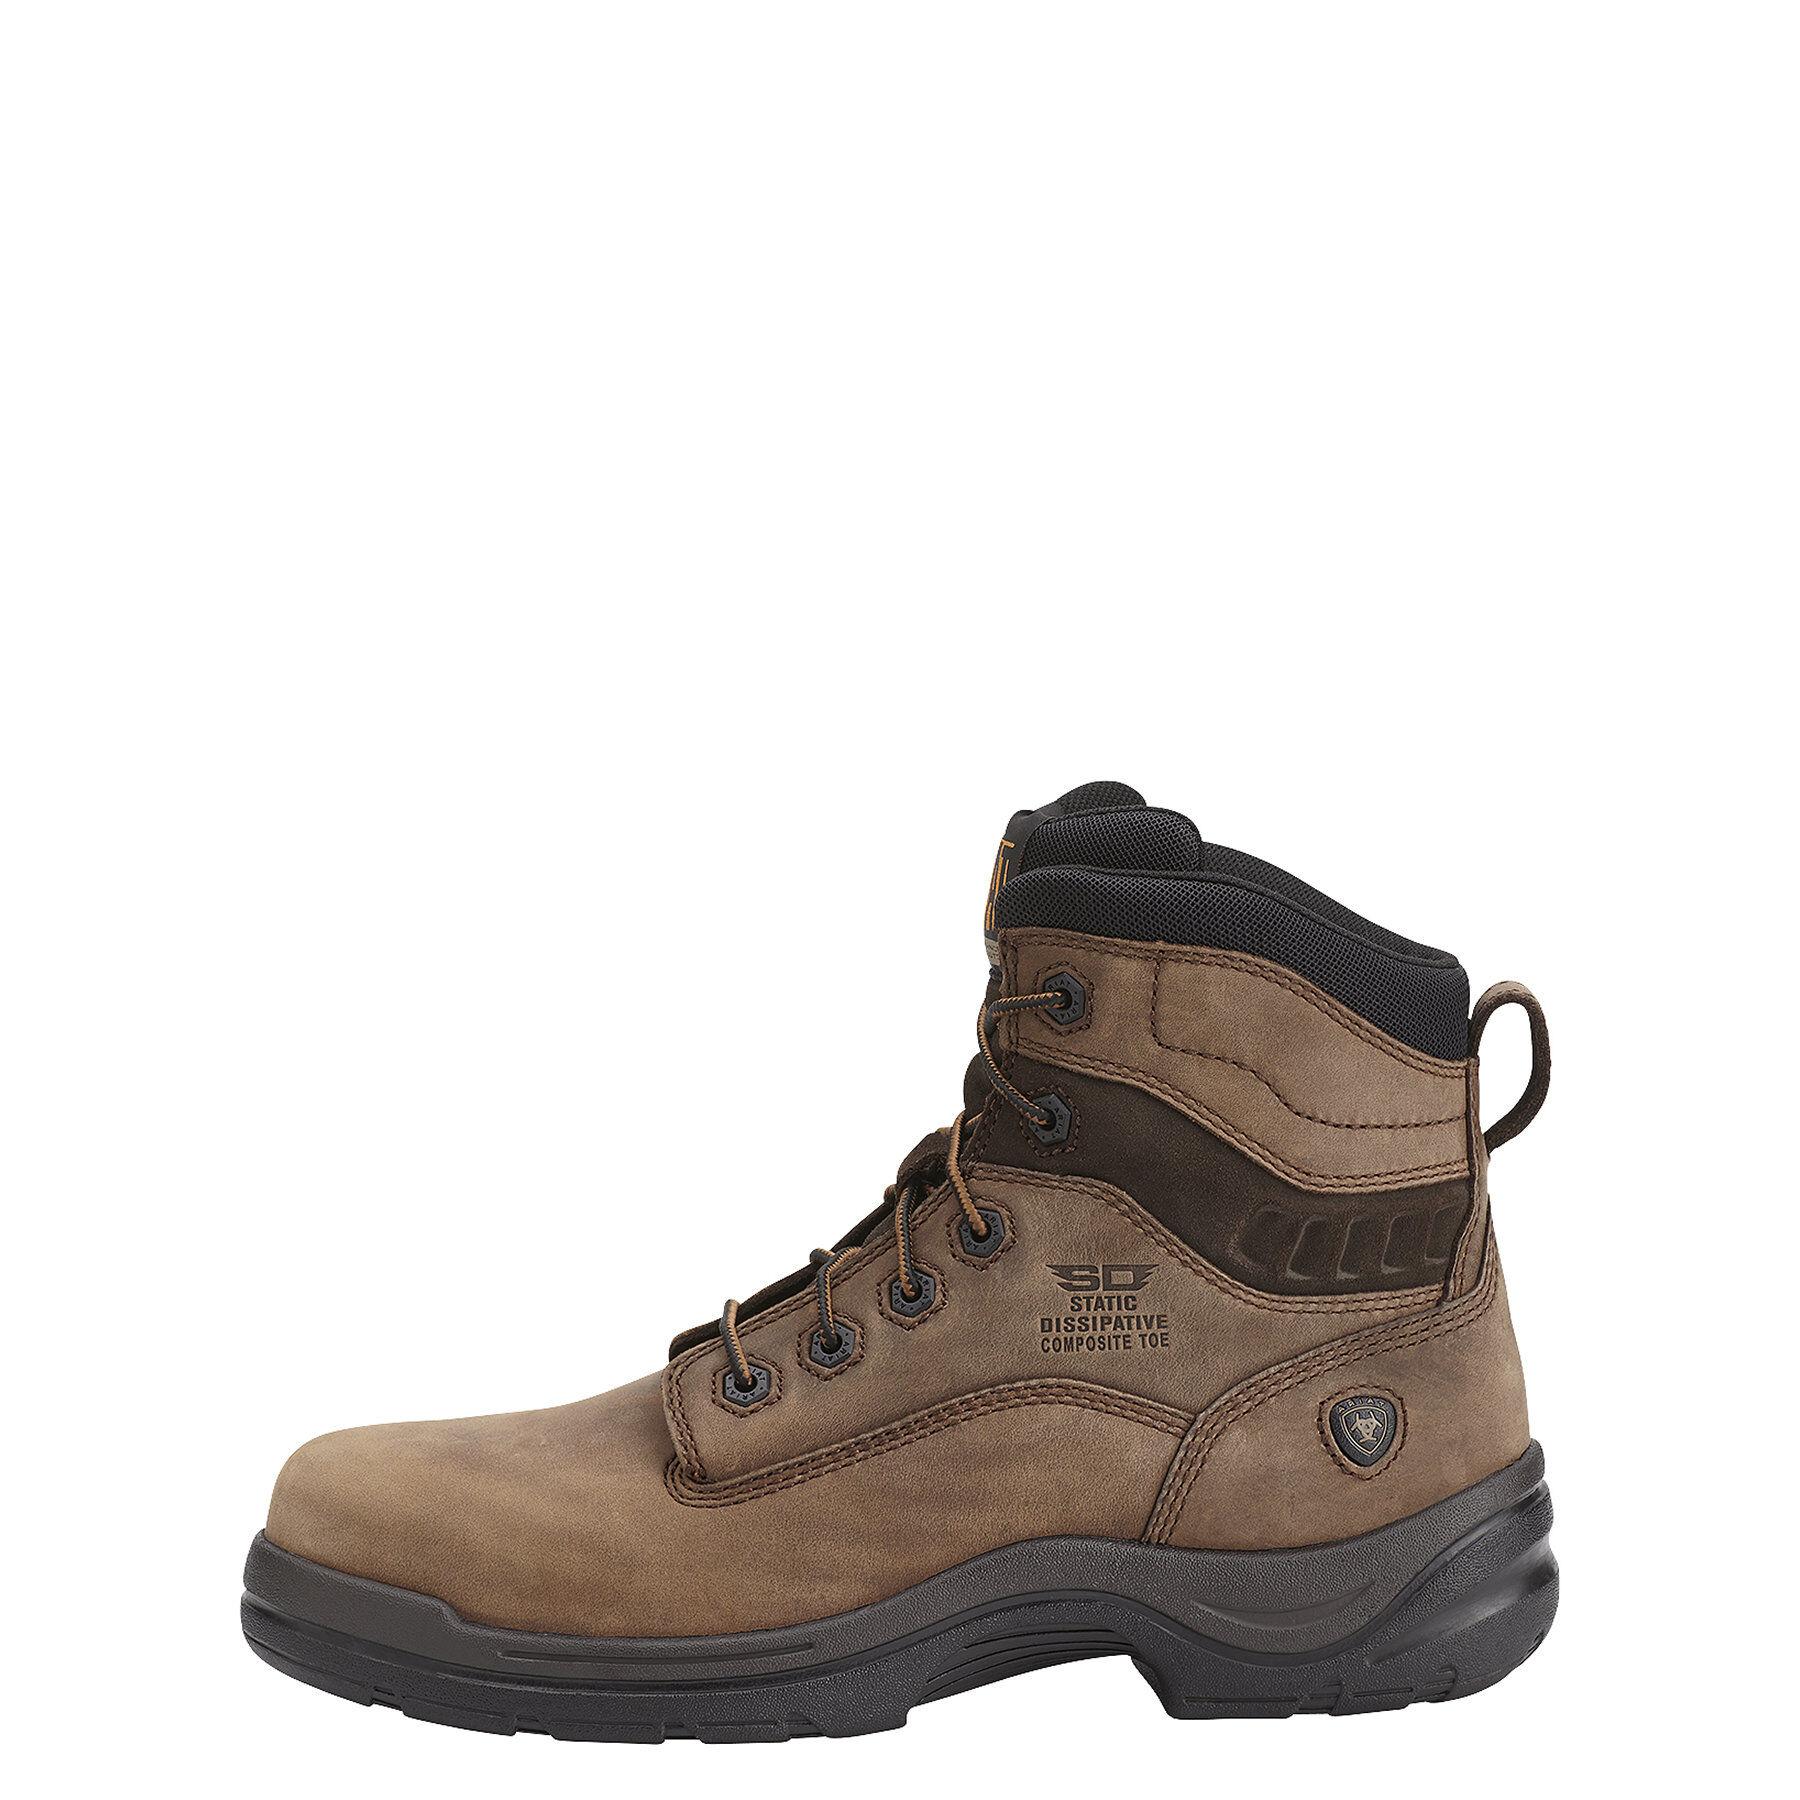 Men's Ariat Flexpro SD Composite Toe, Size: 7 D, Alamo Brown Full Grain Leather